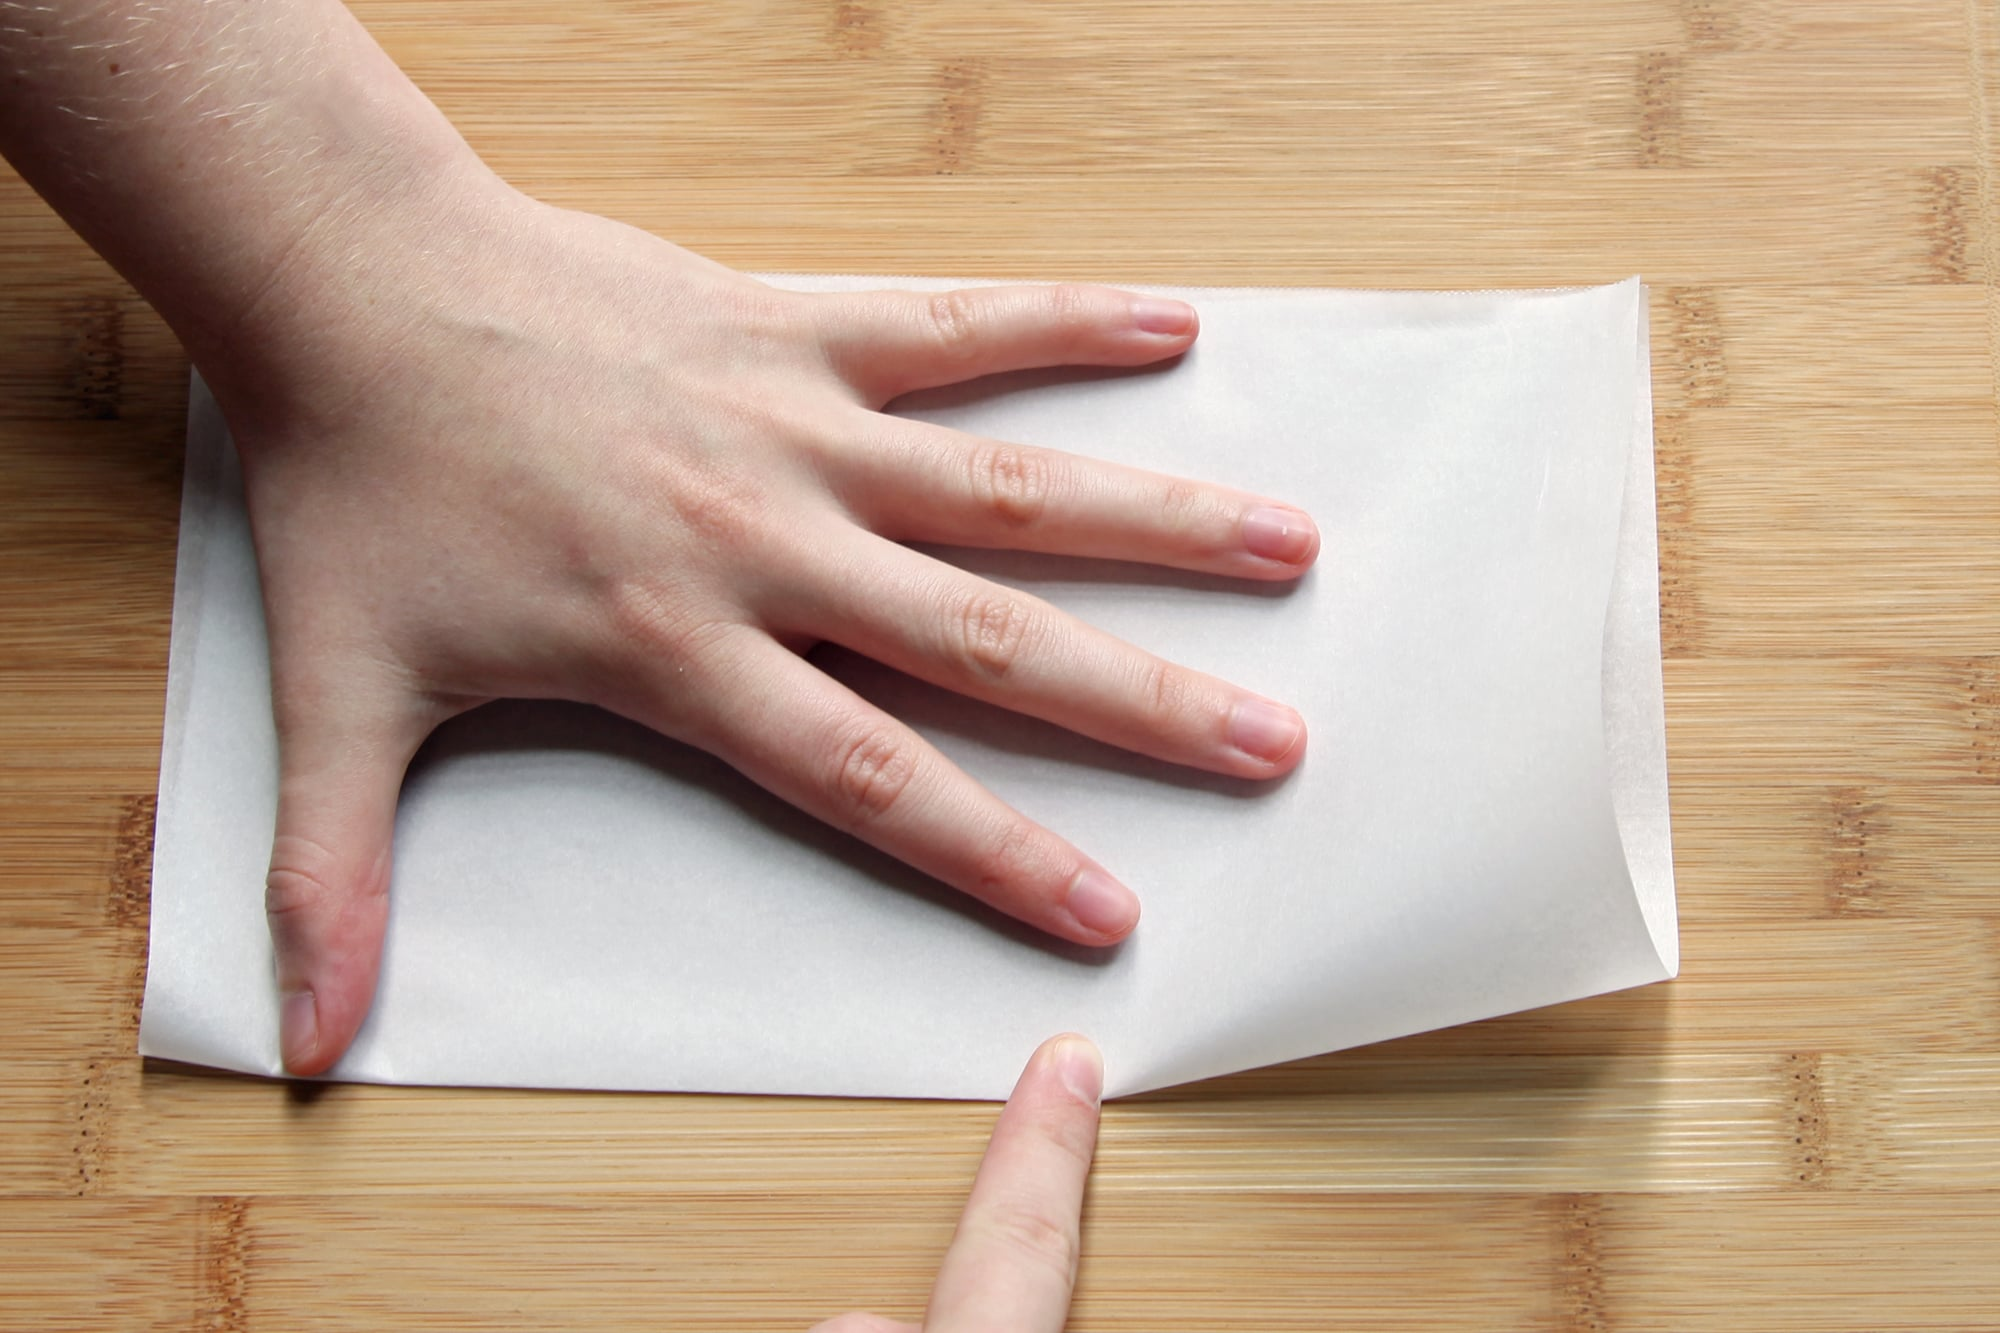 Fold the Square in Half